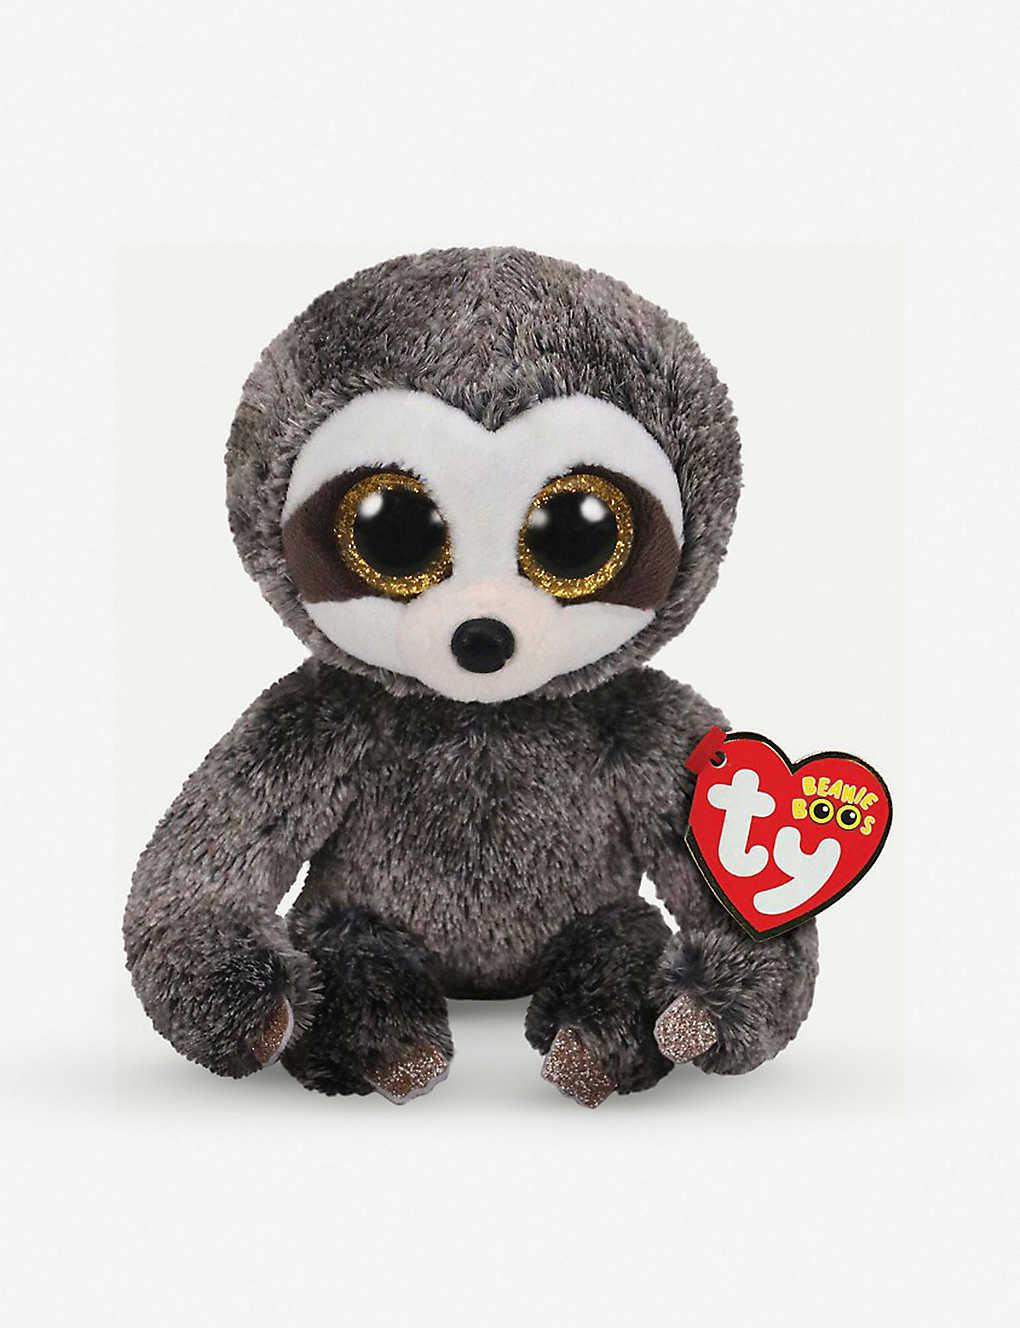 TY - Beanie Boo Dangler sloth soft toy 10cm   Selfridges com